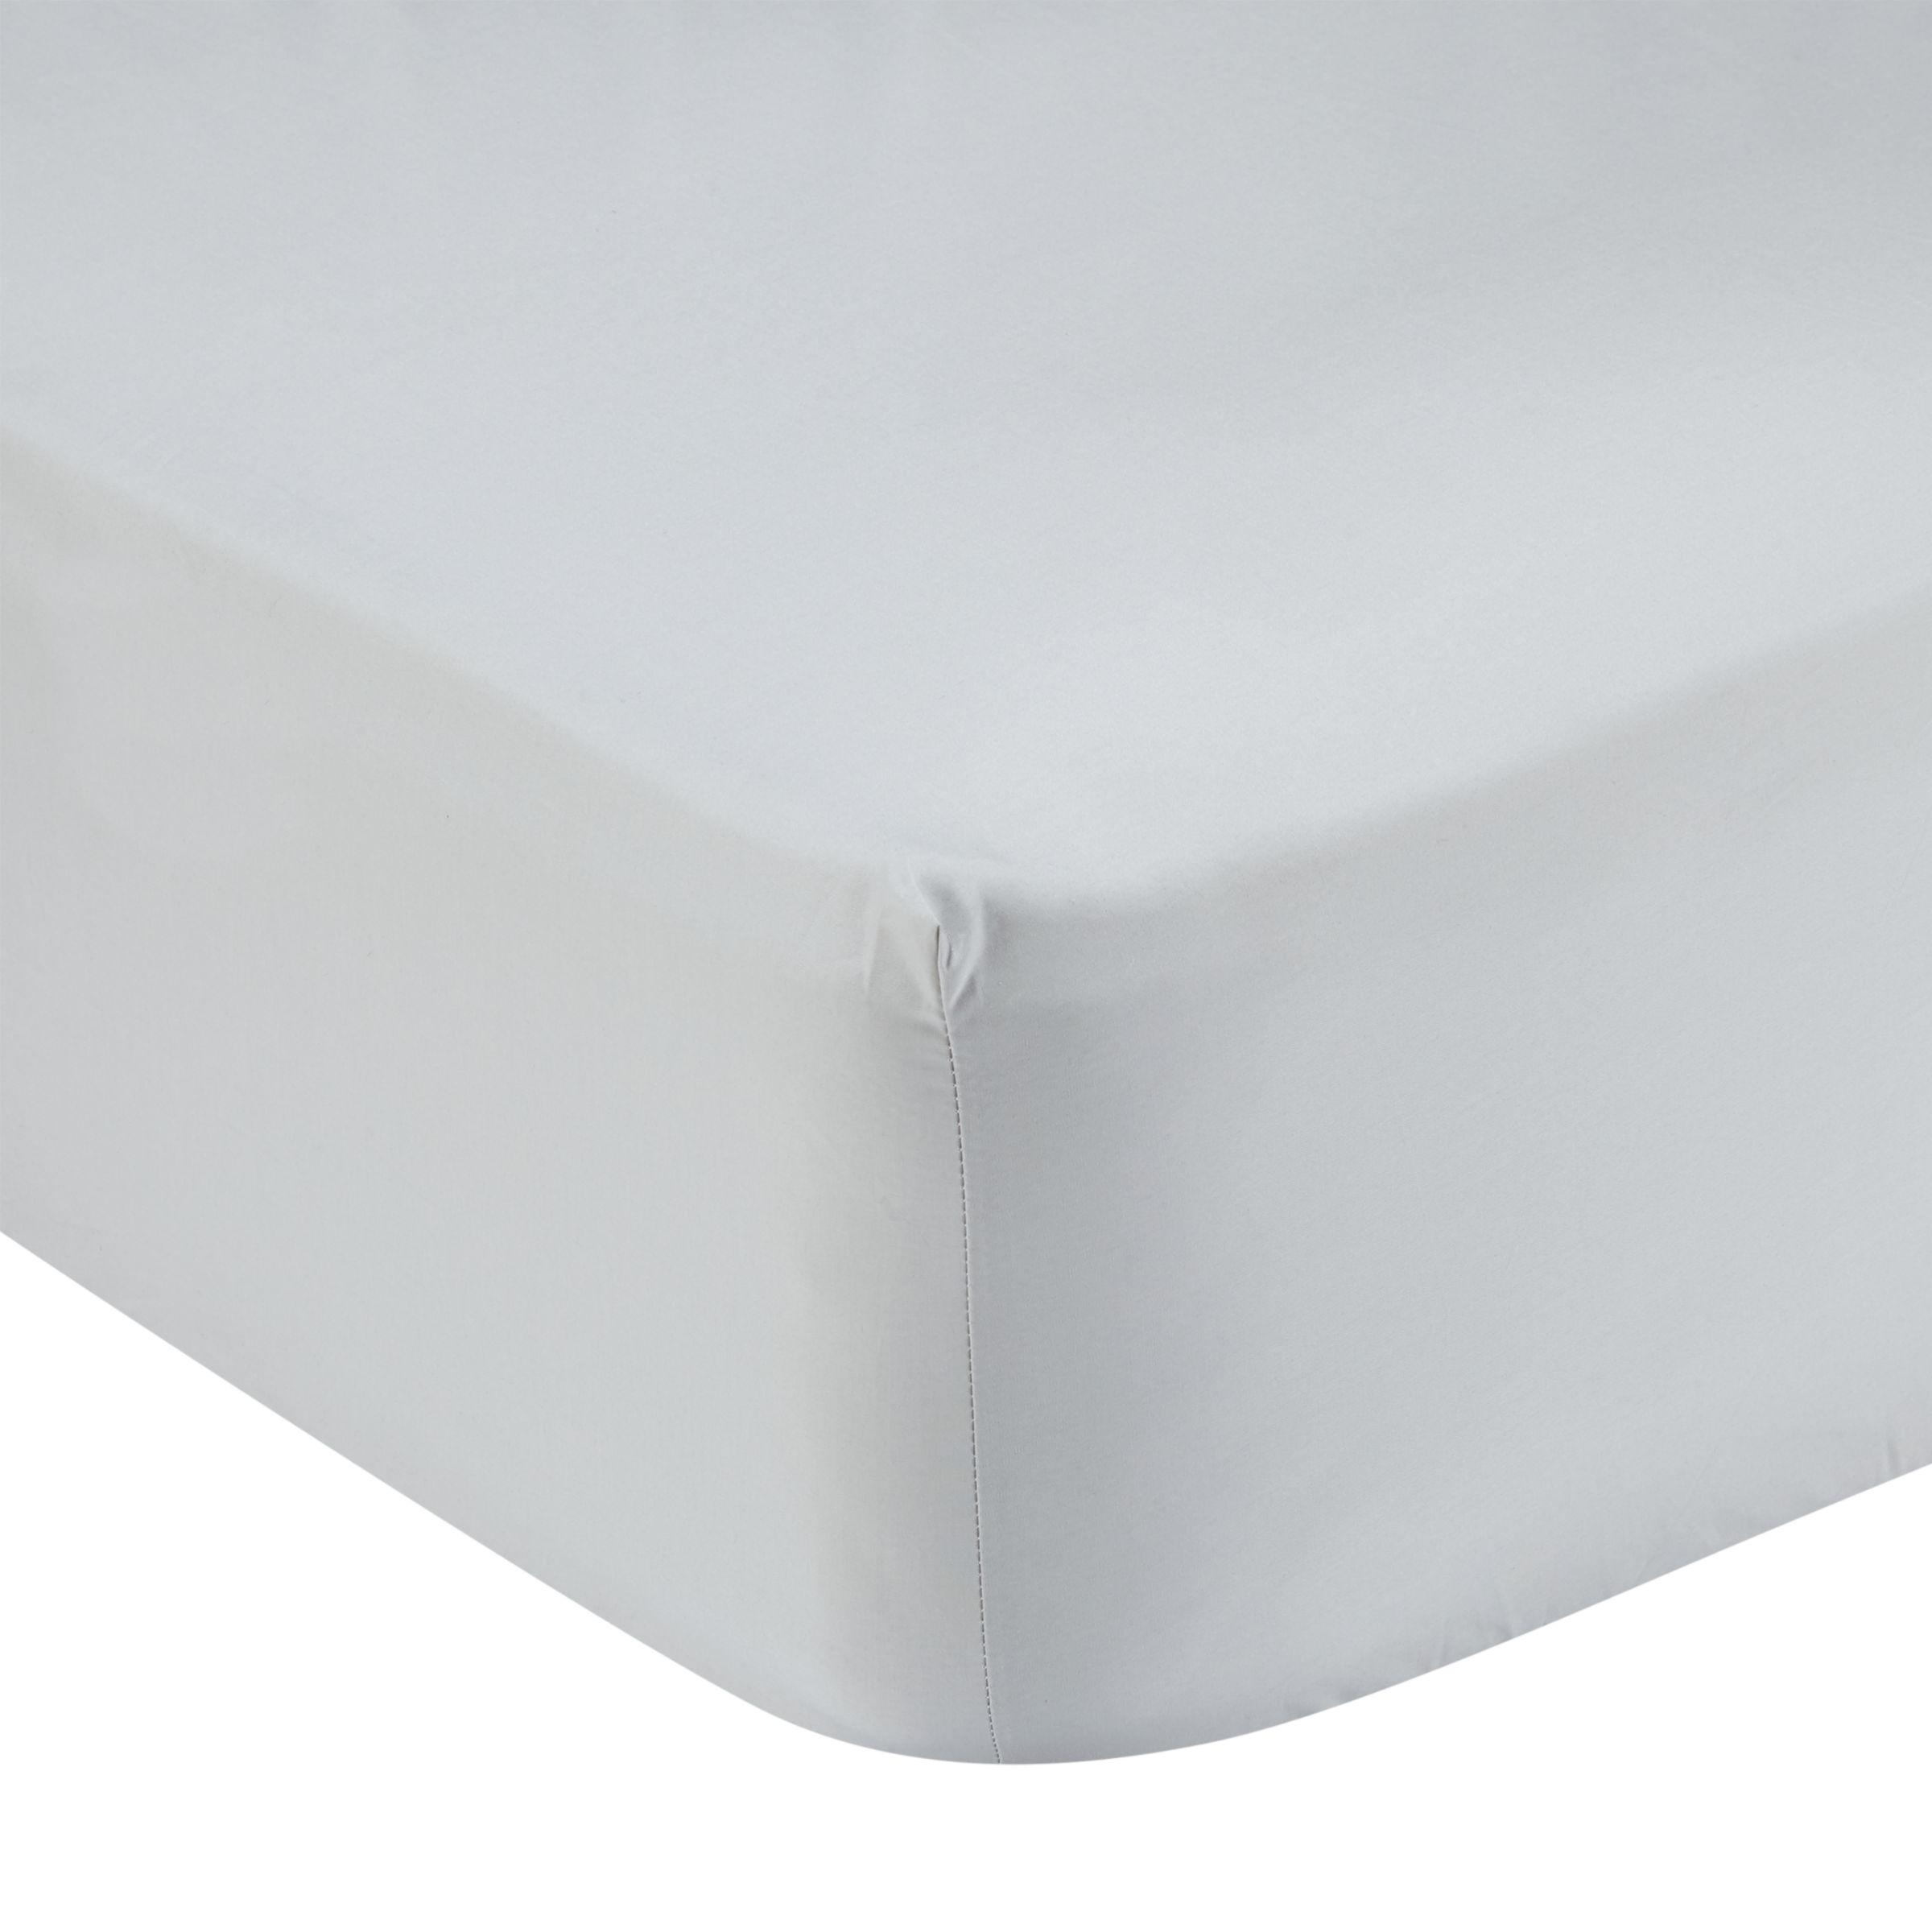 John Lewis & Partners 400 Thread Count Crisp & Fresh Egyptian Cotton Deep Fitted Sheet